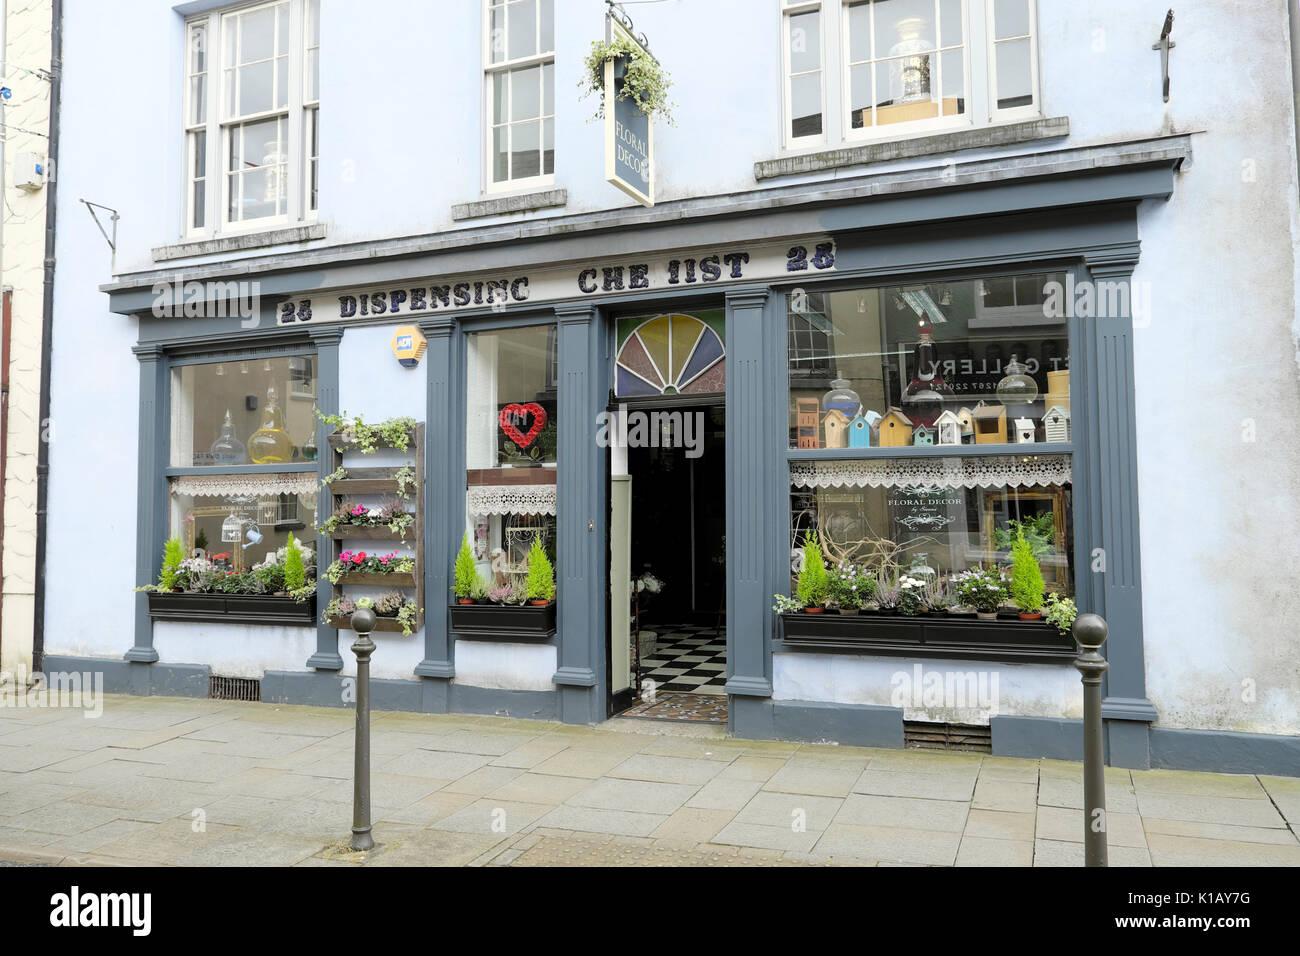 D. King Morgan Dispensing Chemist shop now a florist  in King Street Carmarthen, Carmarthenshire, Wales UK    KATHY DEWITT - Stock Image